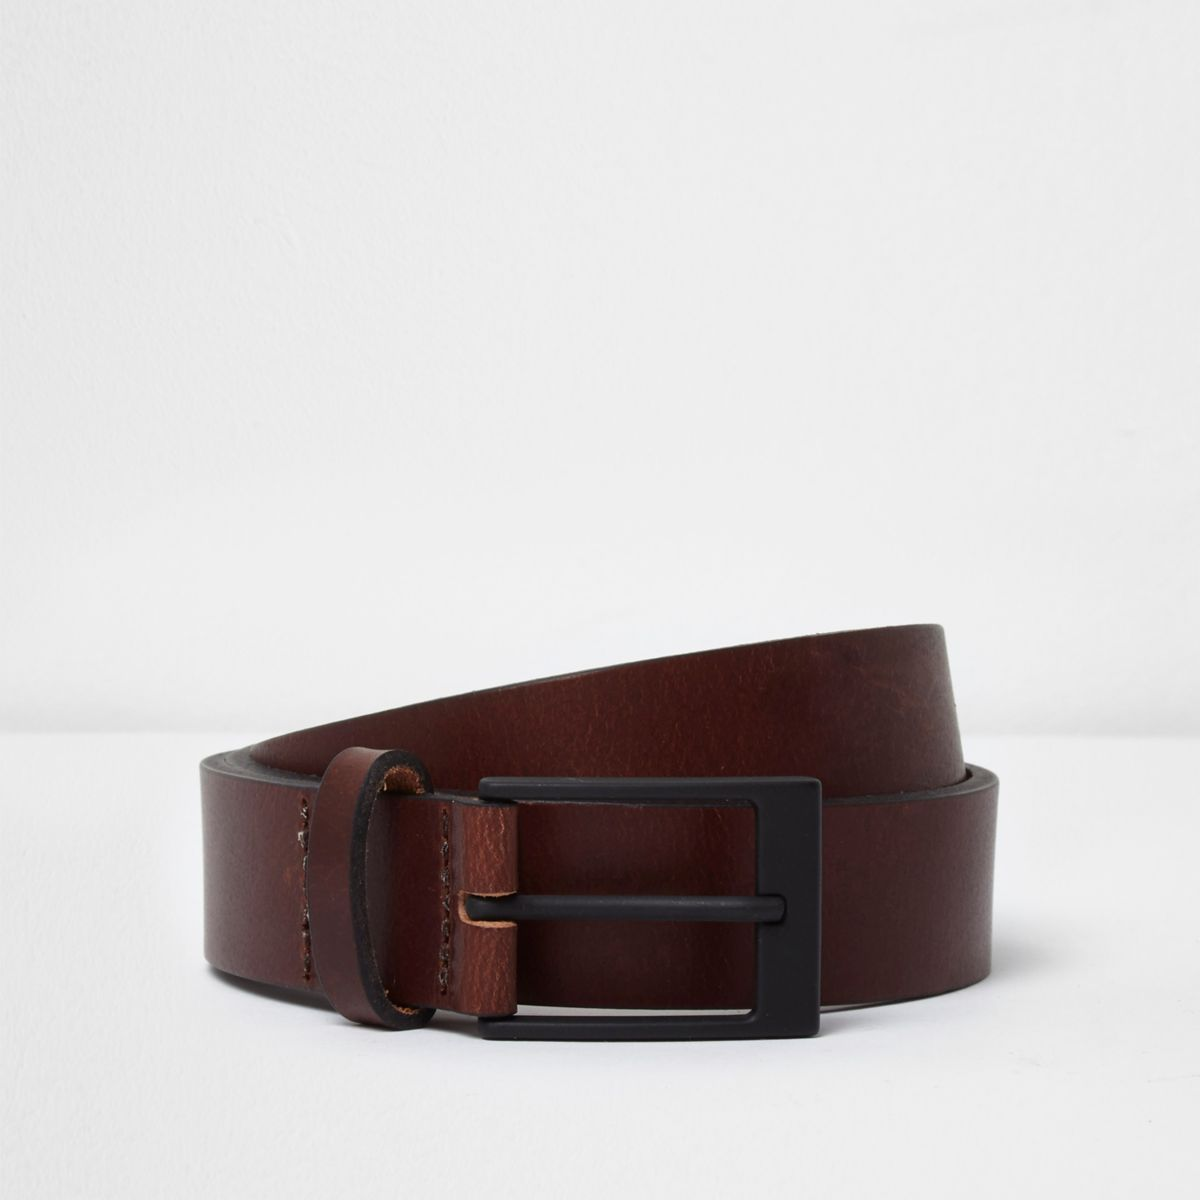 Brown leather black buckle belt